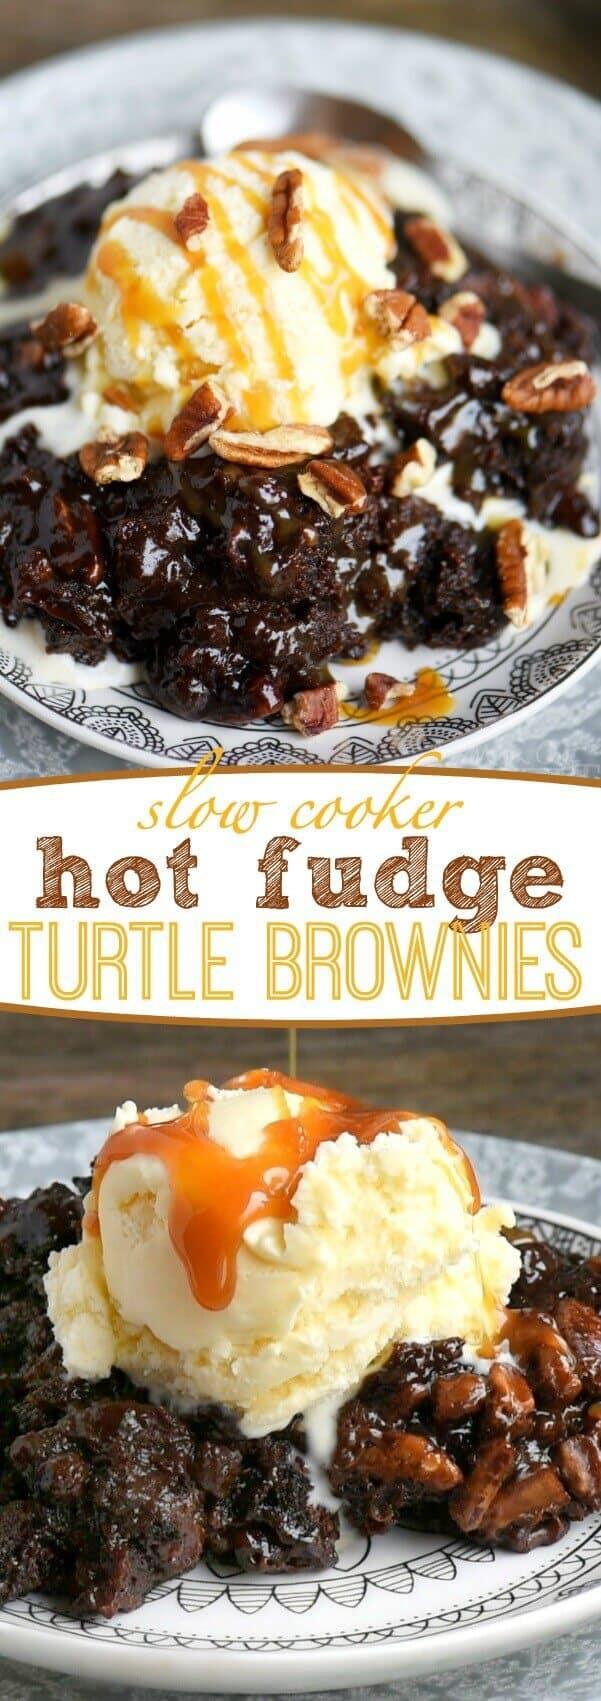 Slow Cooker Hot Fudge Turtle Brownies